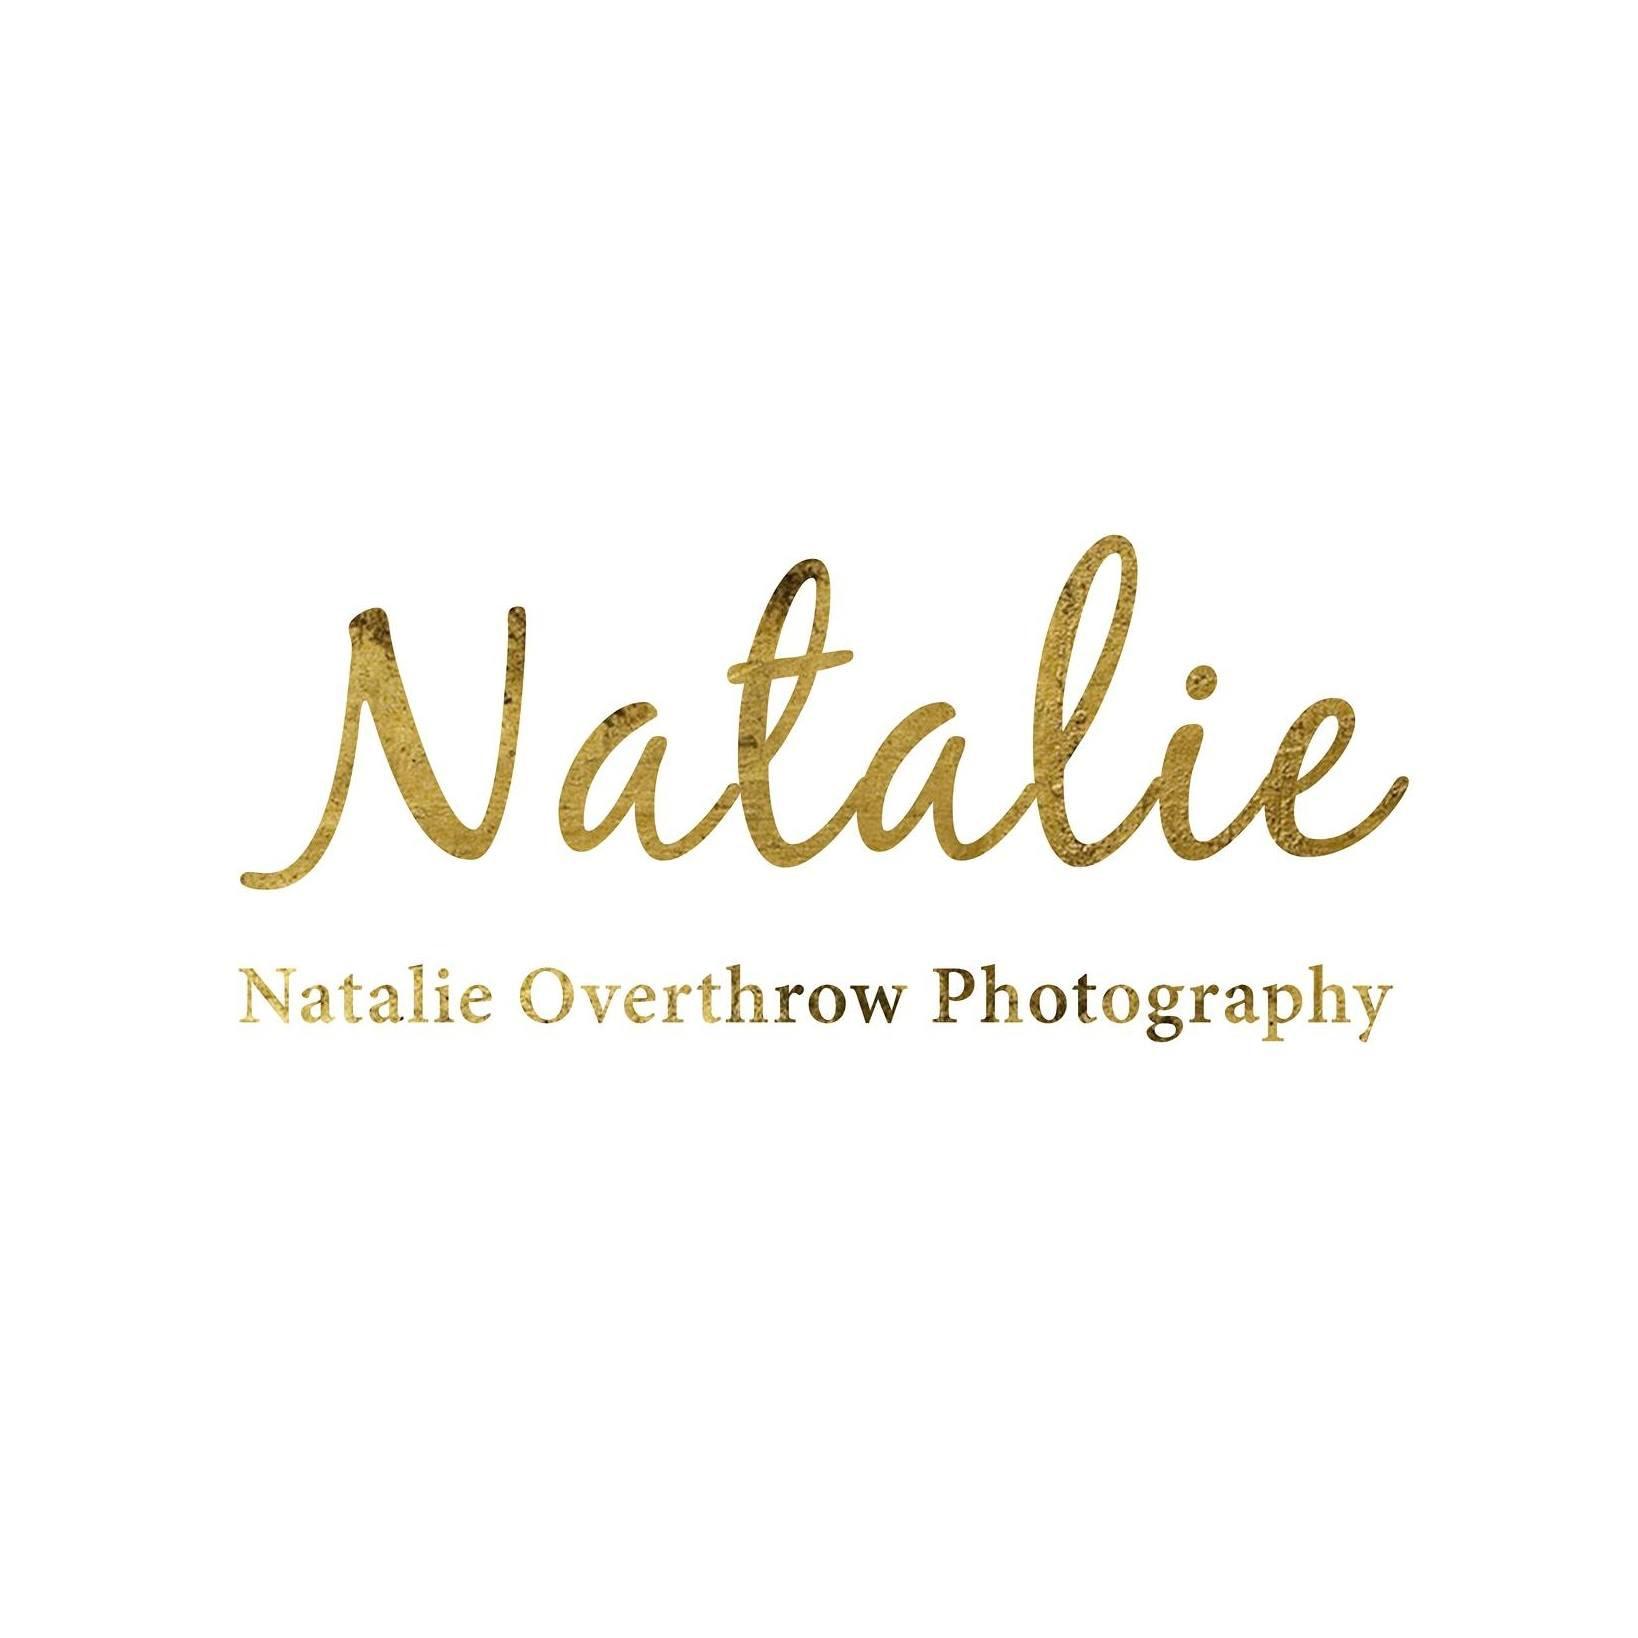 Go to natalie overthrow's profile